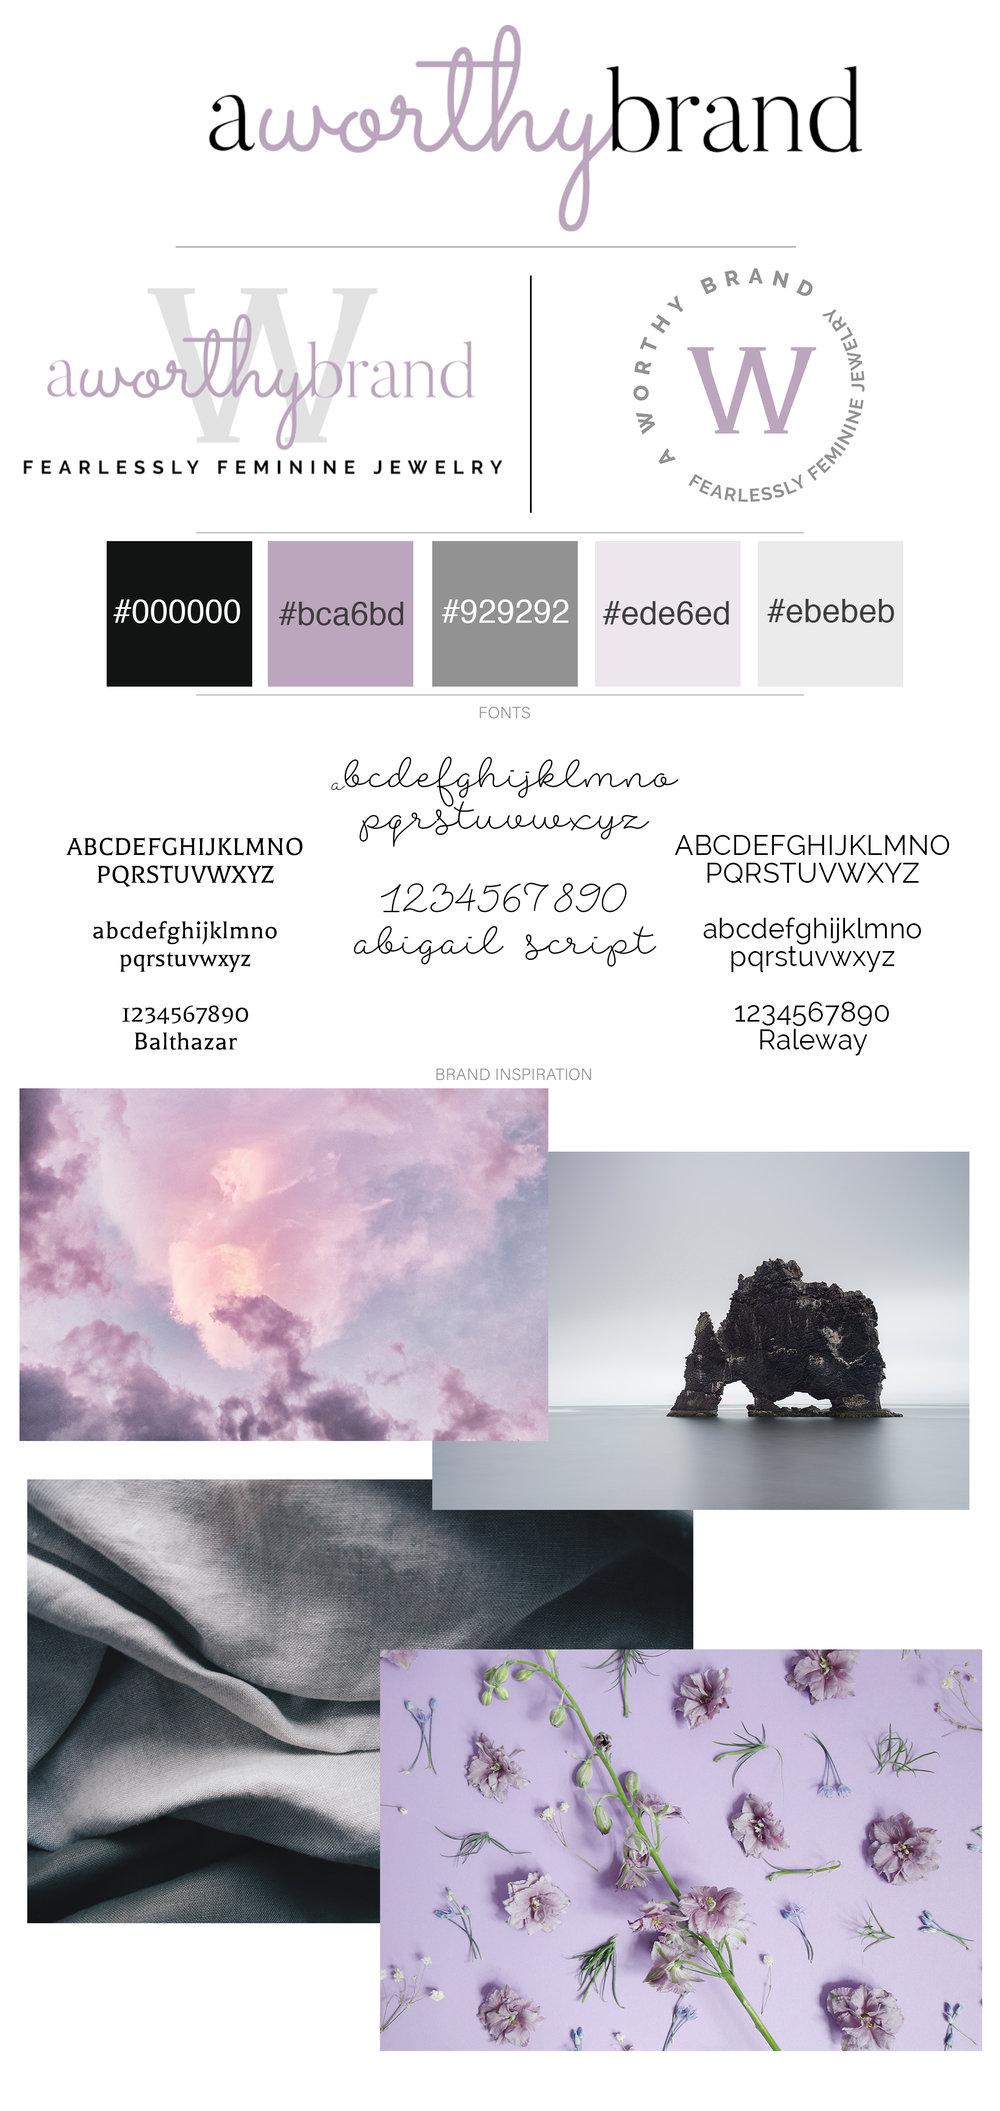 WB Brand Board.jpg